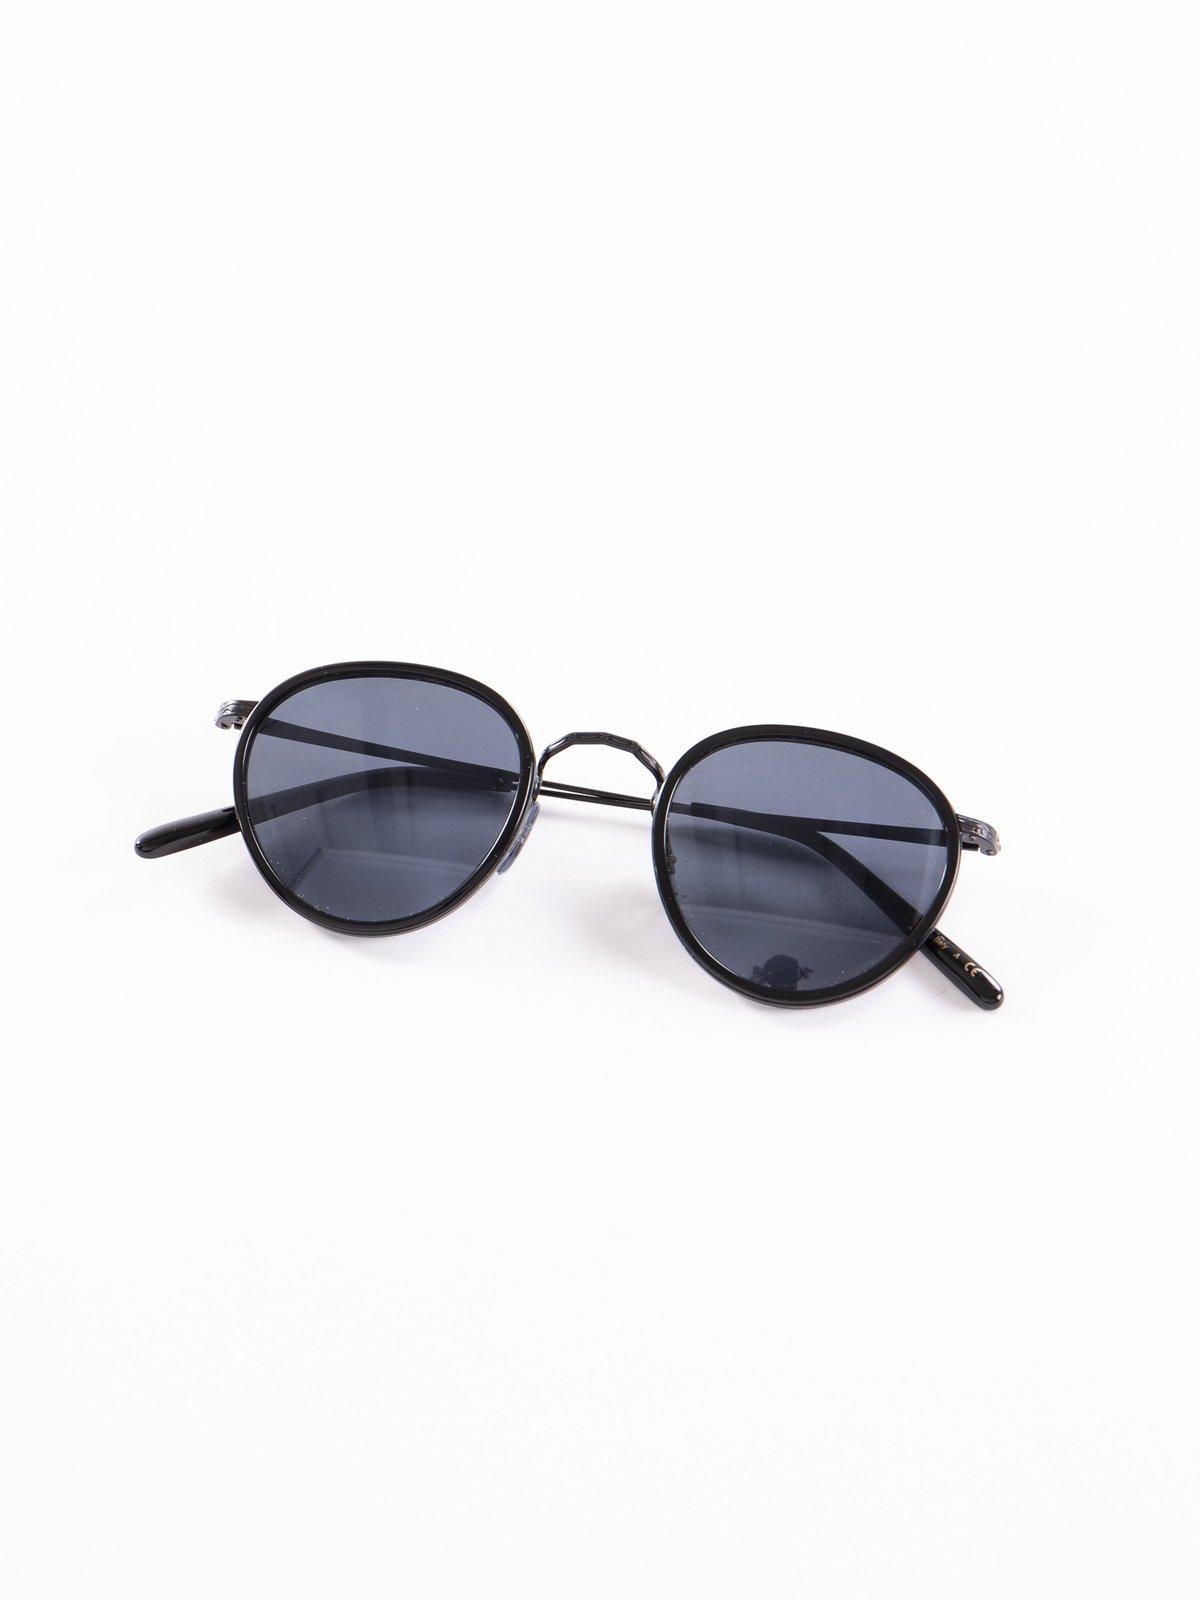 Black–Matte Black/Blue MP–2 Sunglasses - Image 1